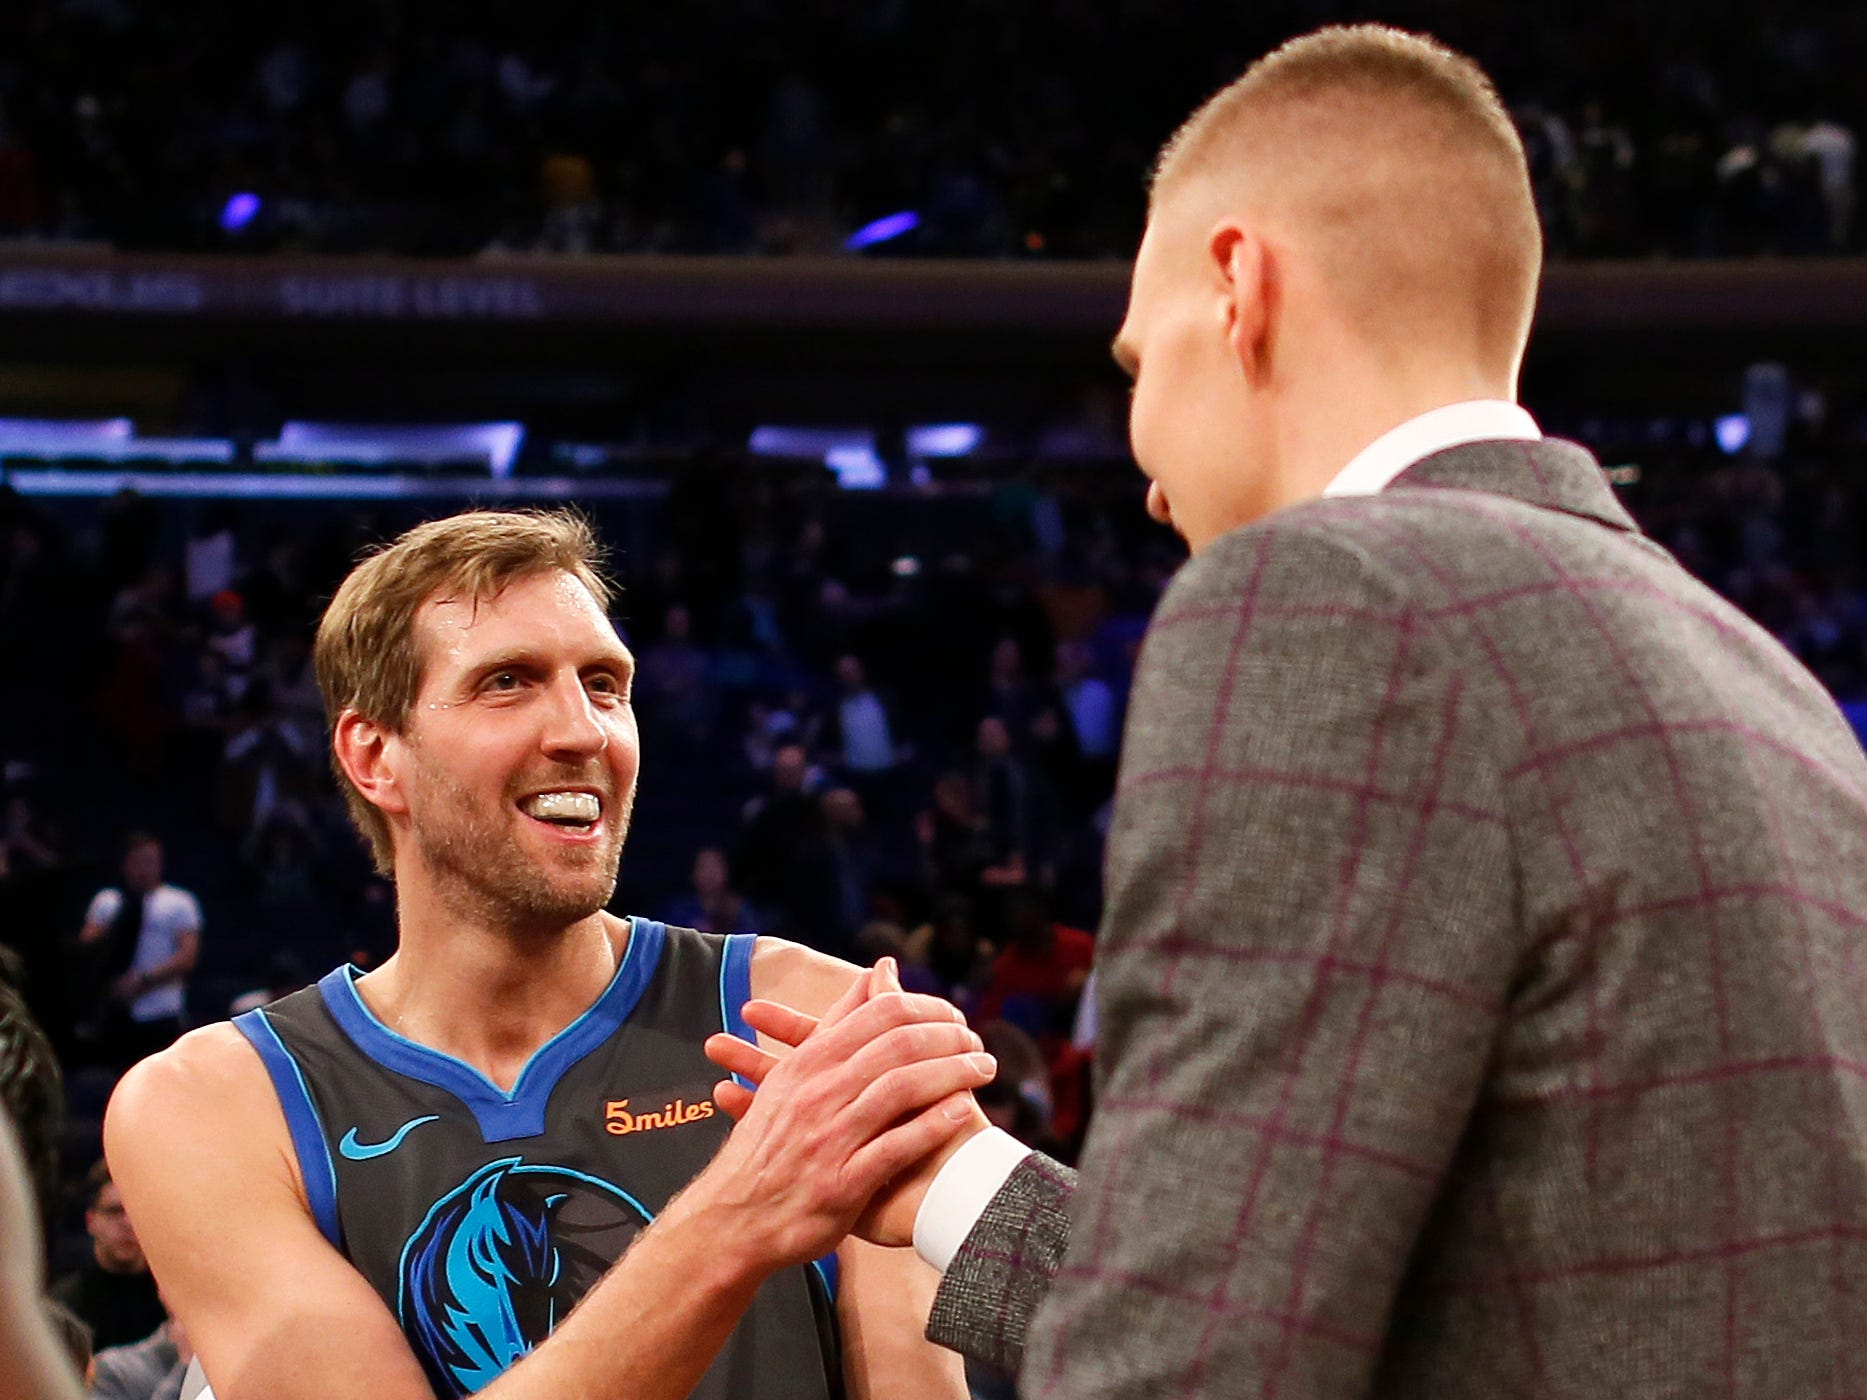 Jan 30, 2019; New York, NY, USA; Dallas Mavericks forward Dirk Nowitzki (41) shakes hands with New York Knicks forward Kristaps Porzingis (6) at Madison Square Garden.